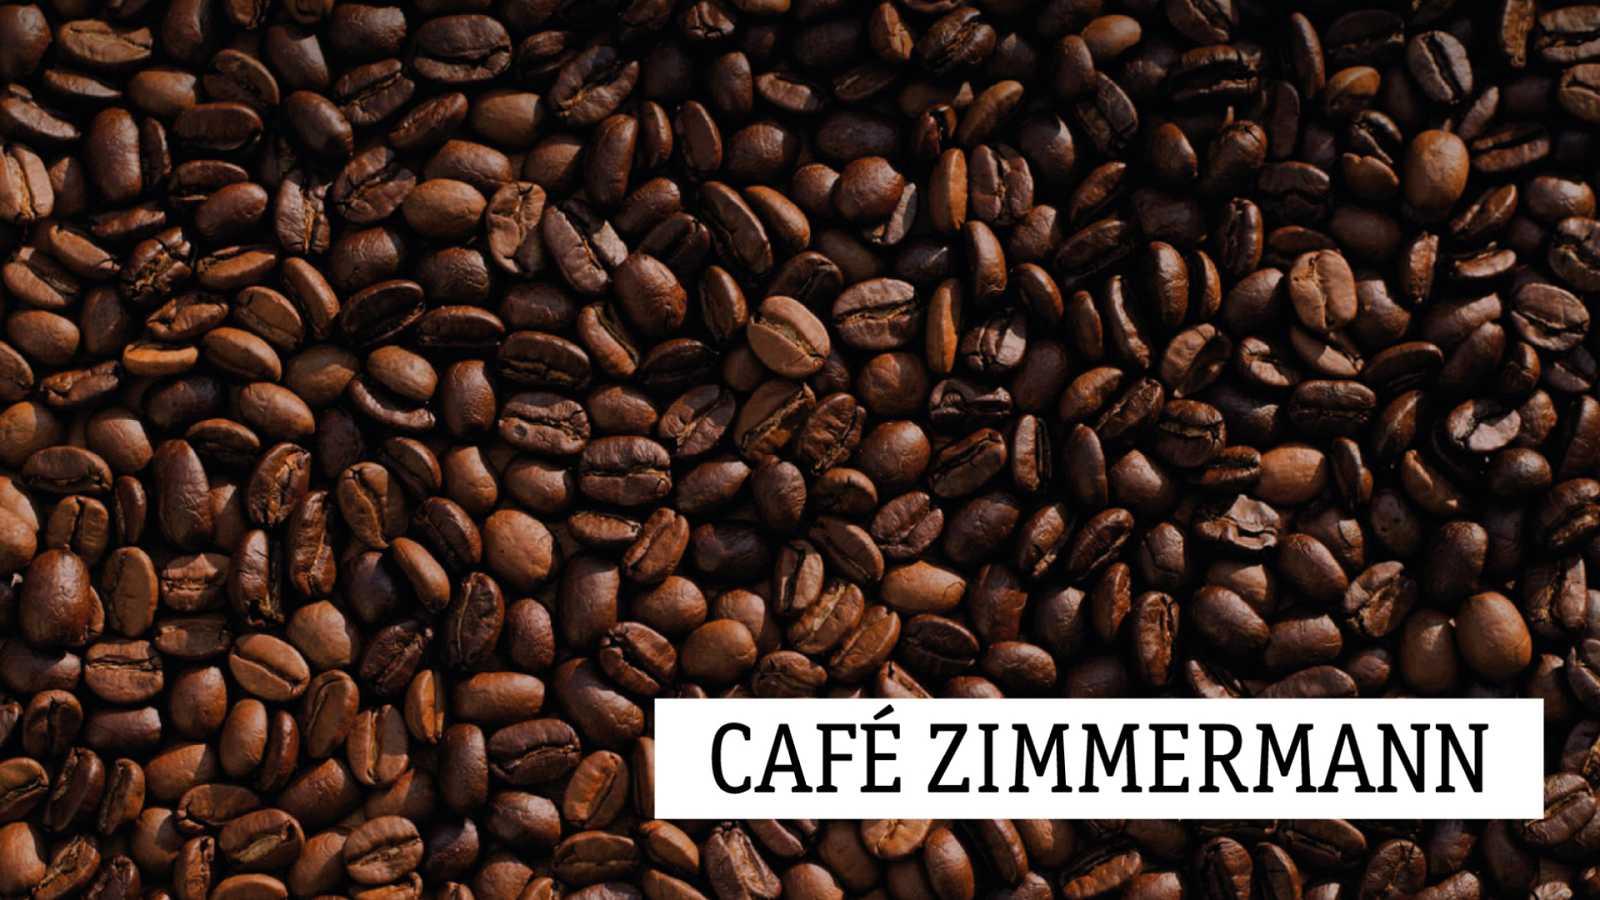 Café Zimmermann - Maynard Solomon - 10/11/20 - escuchar ahora